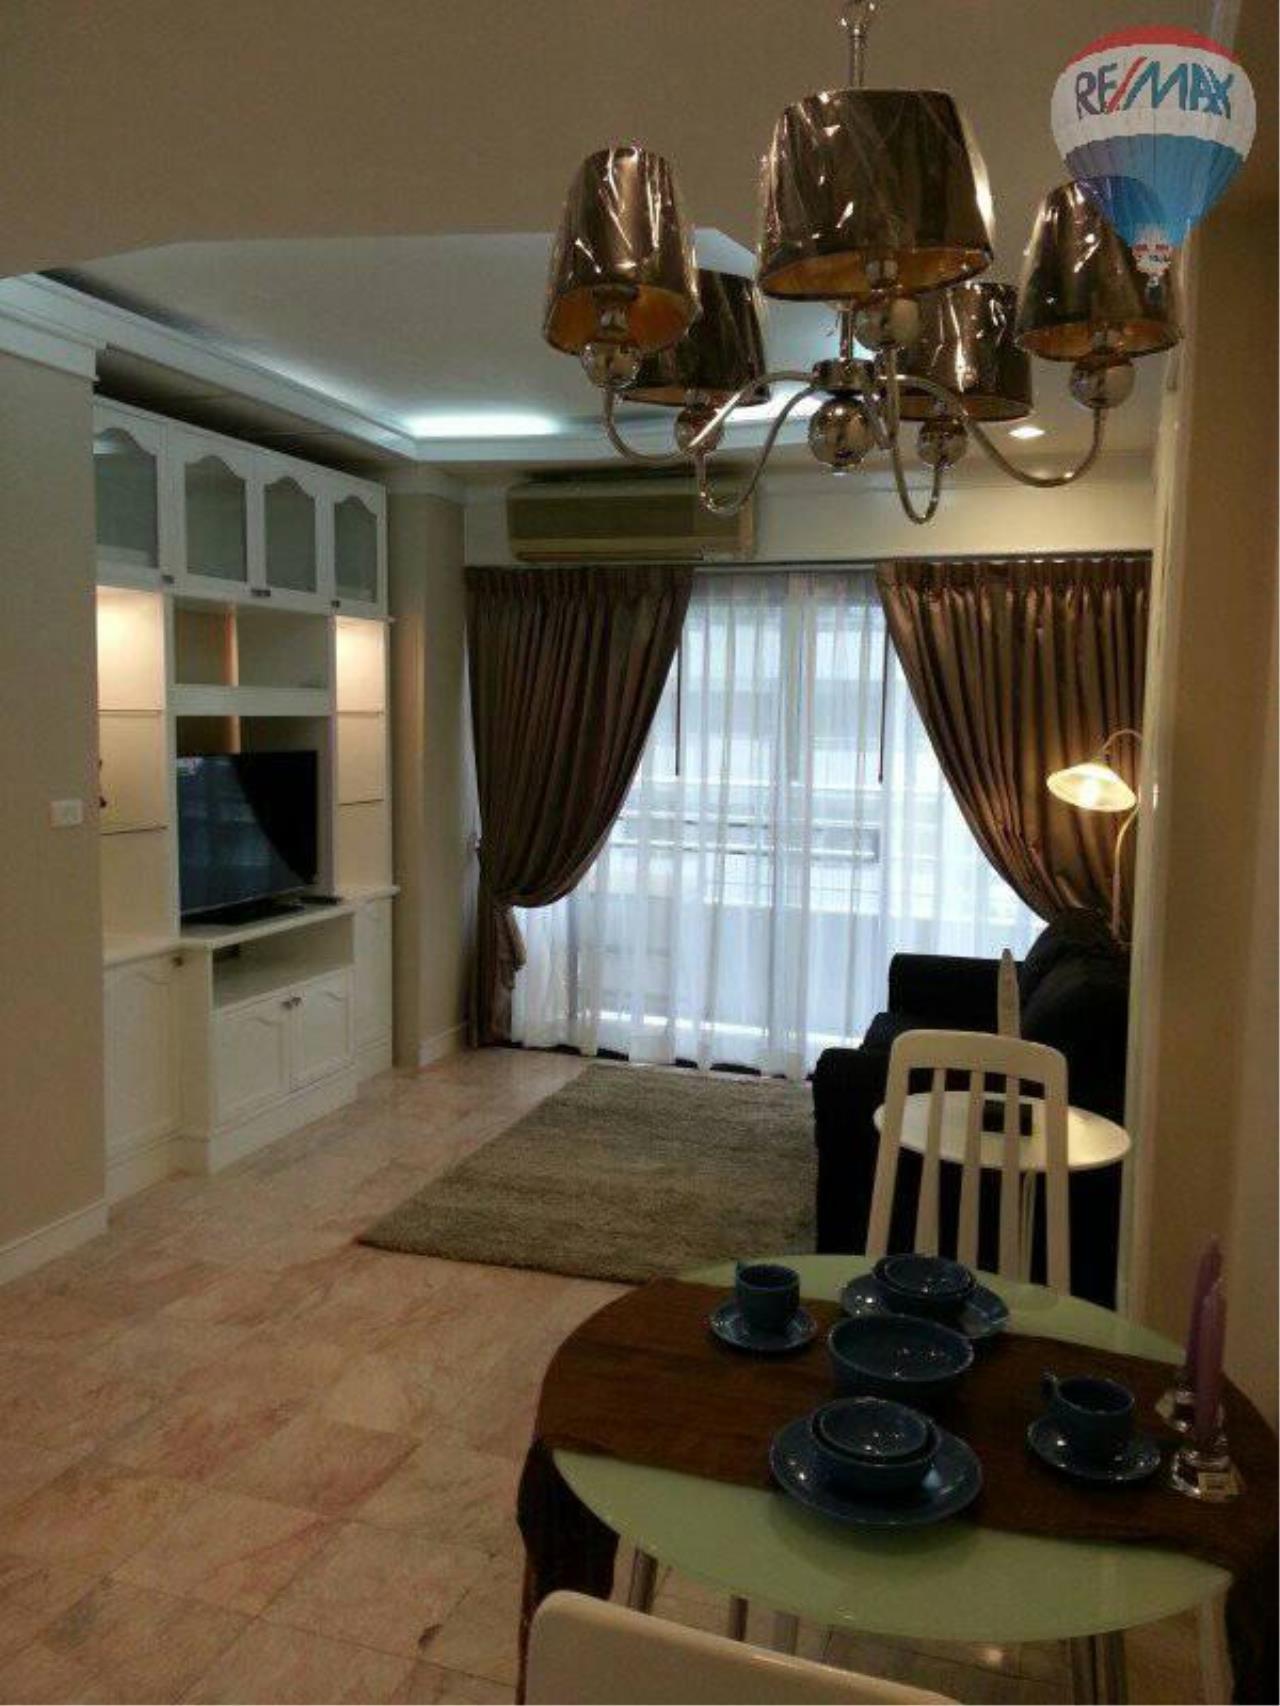 RE/MAX Properties Agency's 1 Bedroom 60 Sq.m for RENT at Saranjai Mansion,Sukhumvit Soi 4 (Nana) 11